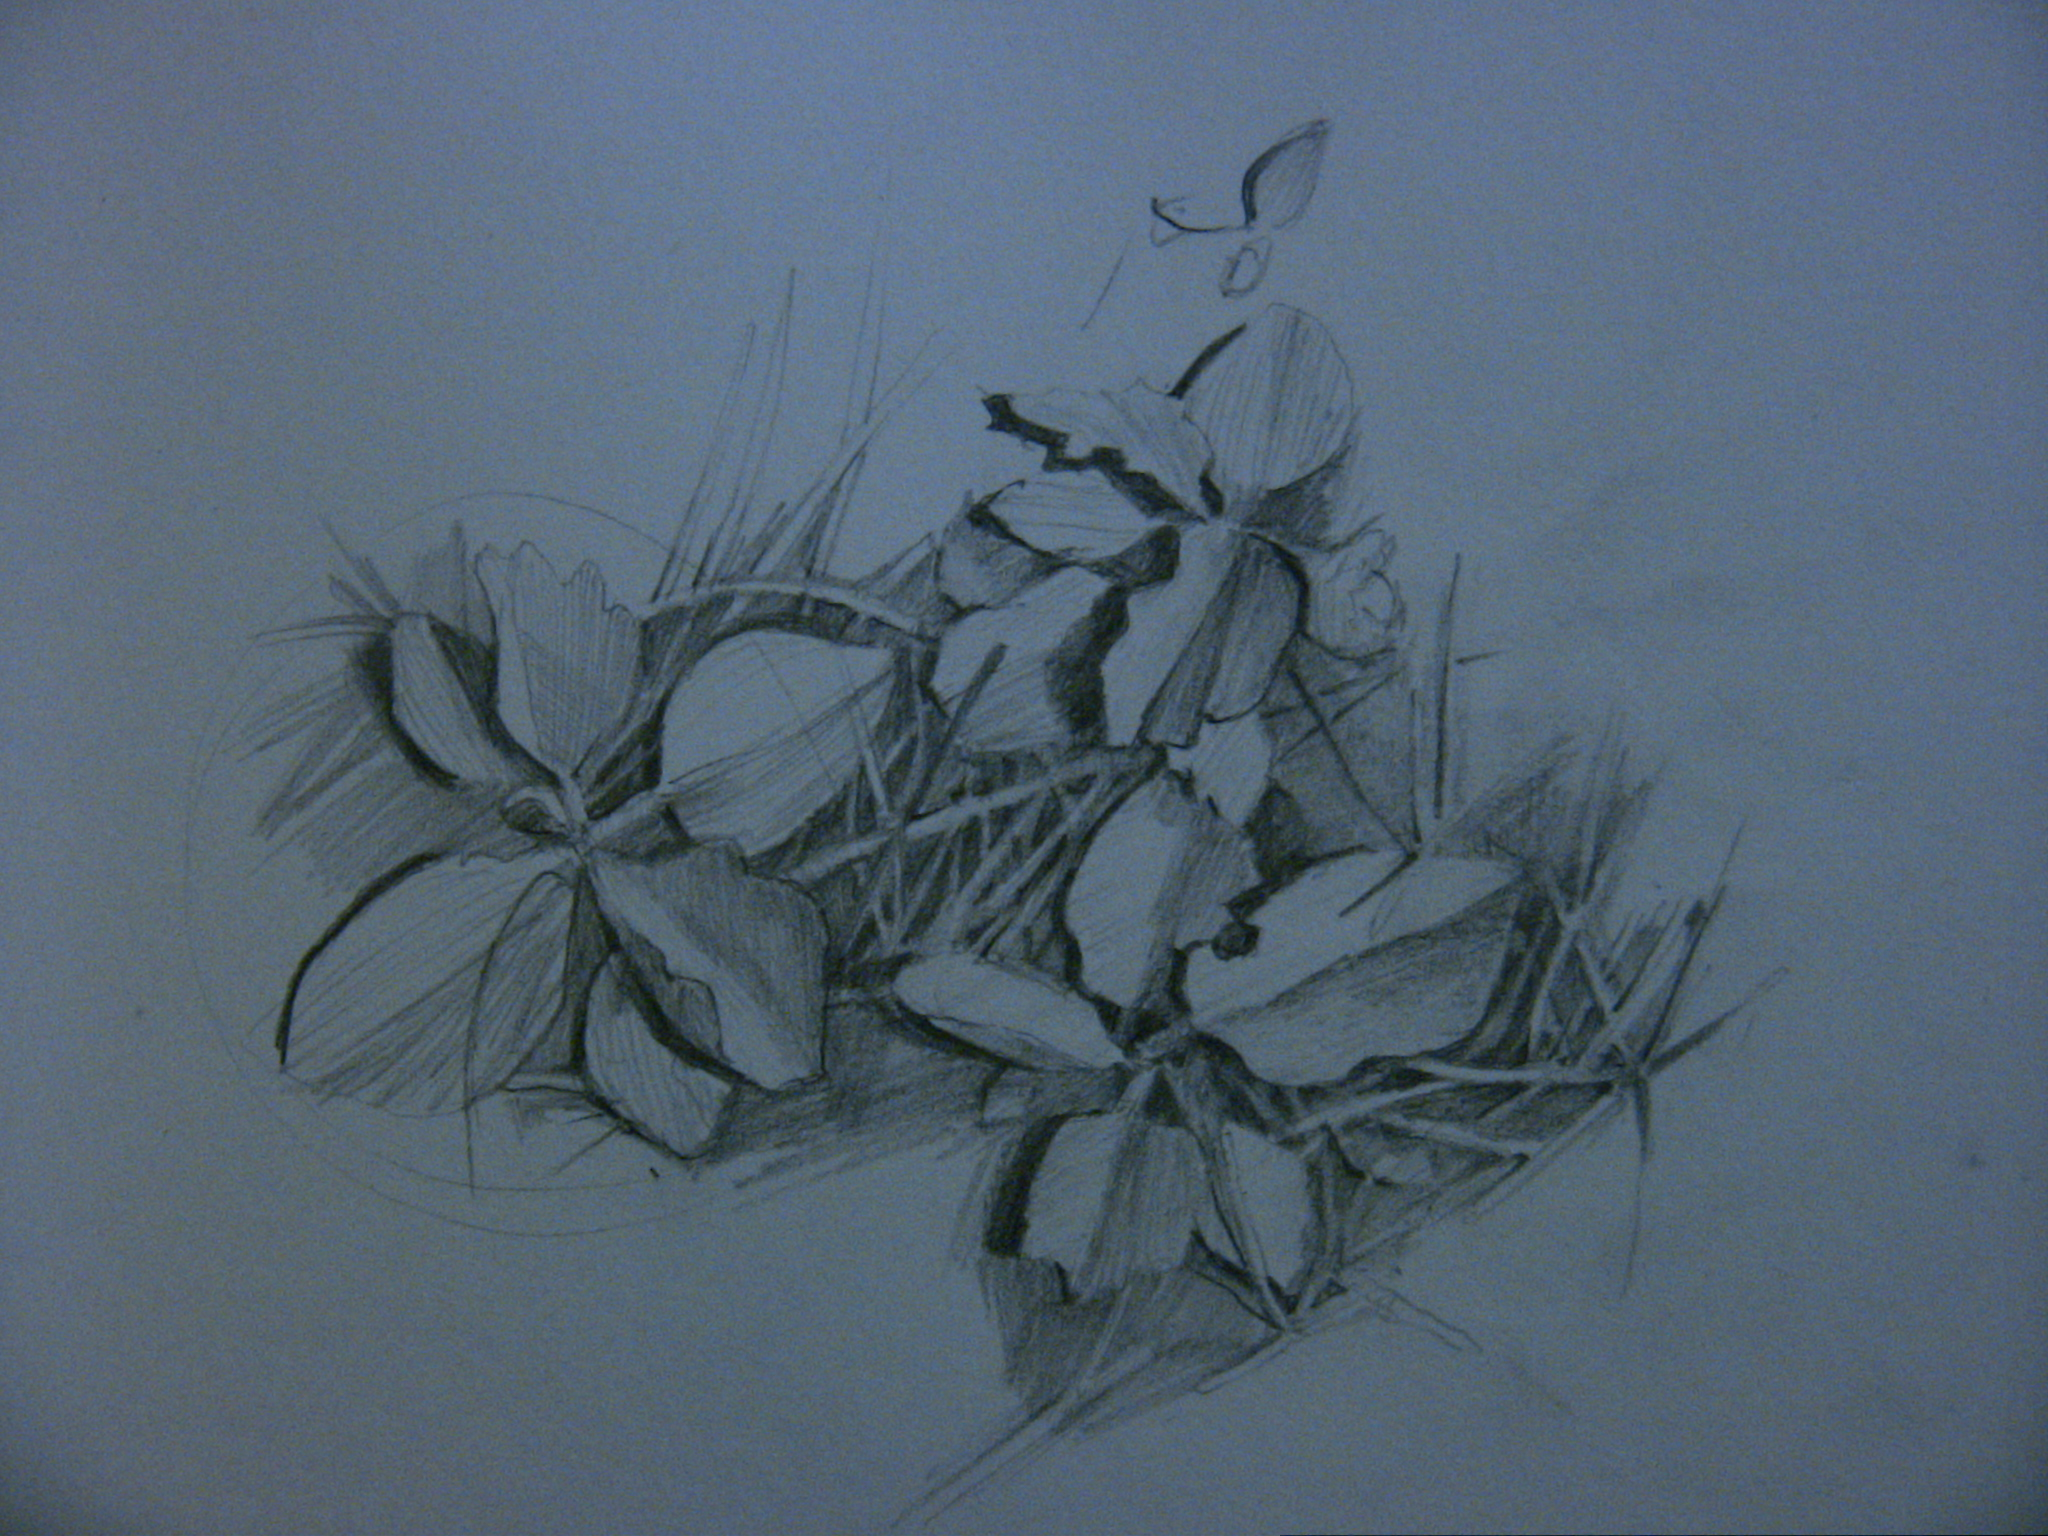 Drawings made in Thunder Bay